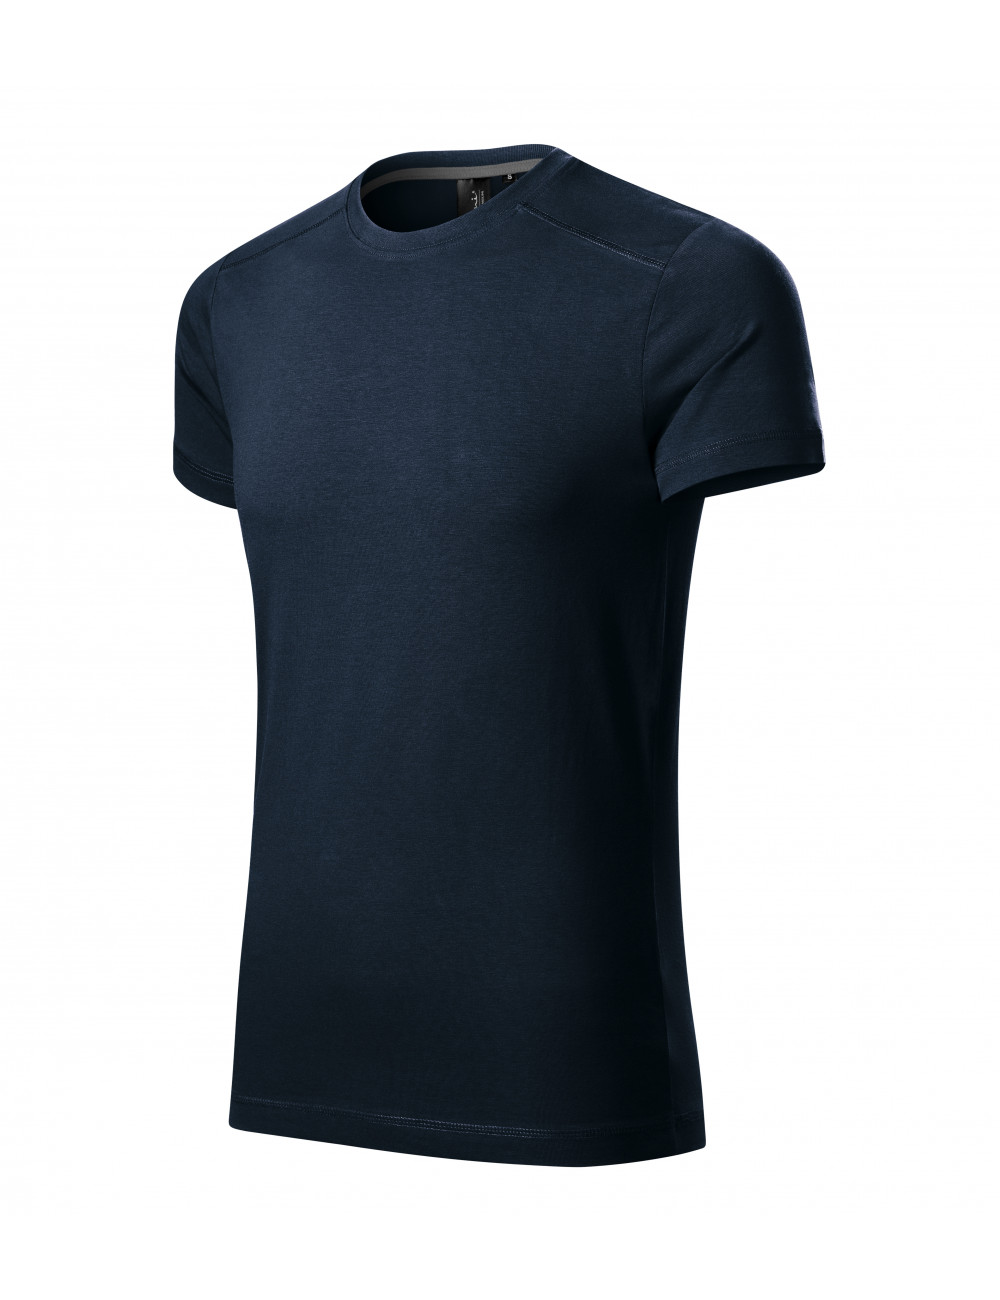 Adler MALFINIPREMIUM Koszulka męska Action 150 ombre blue